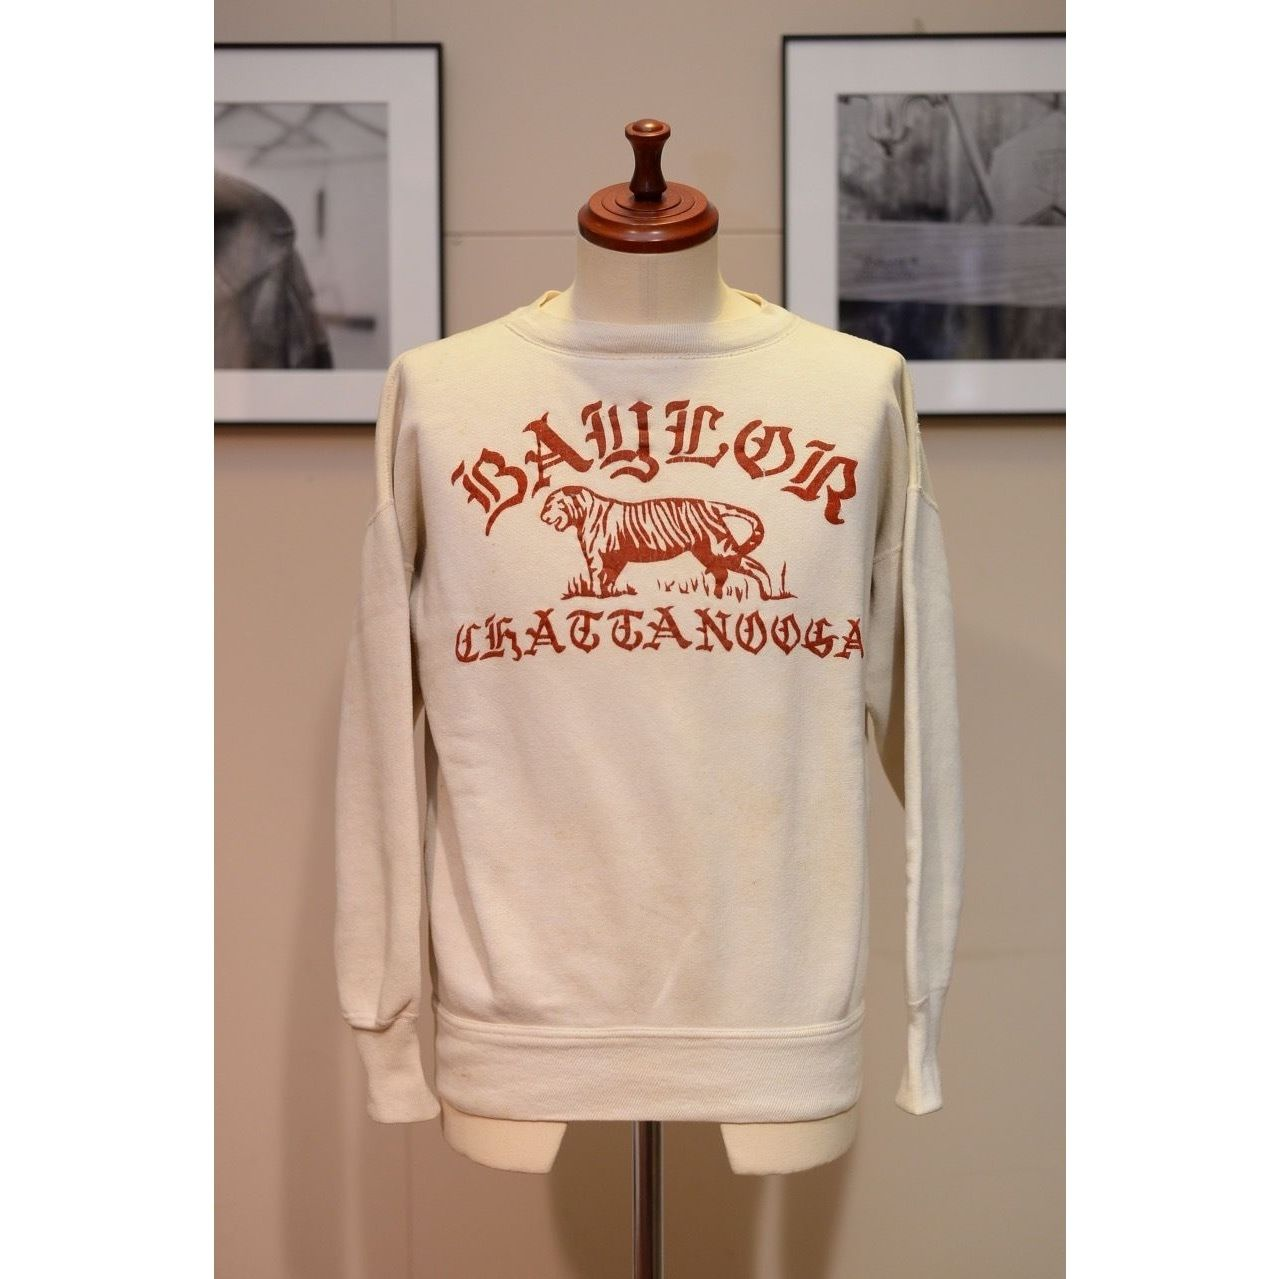 U.S.VINTAGE 50'S フロッキープリントスウェットシャツ